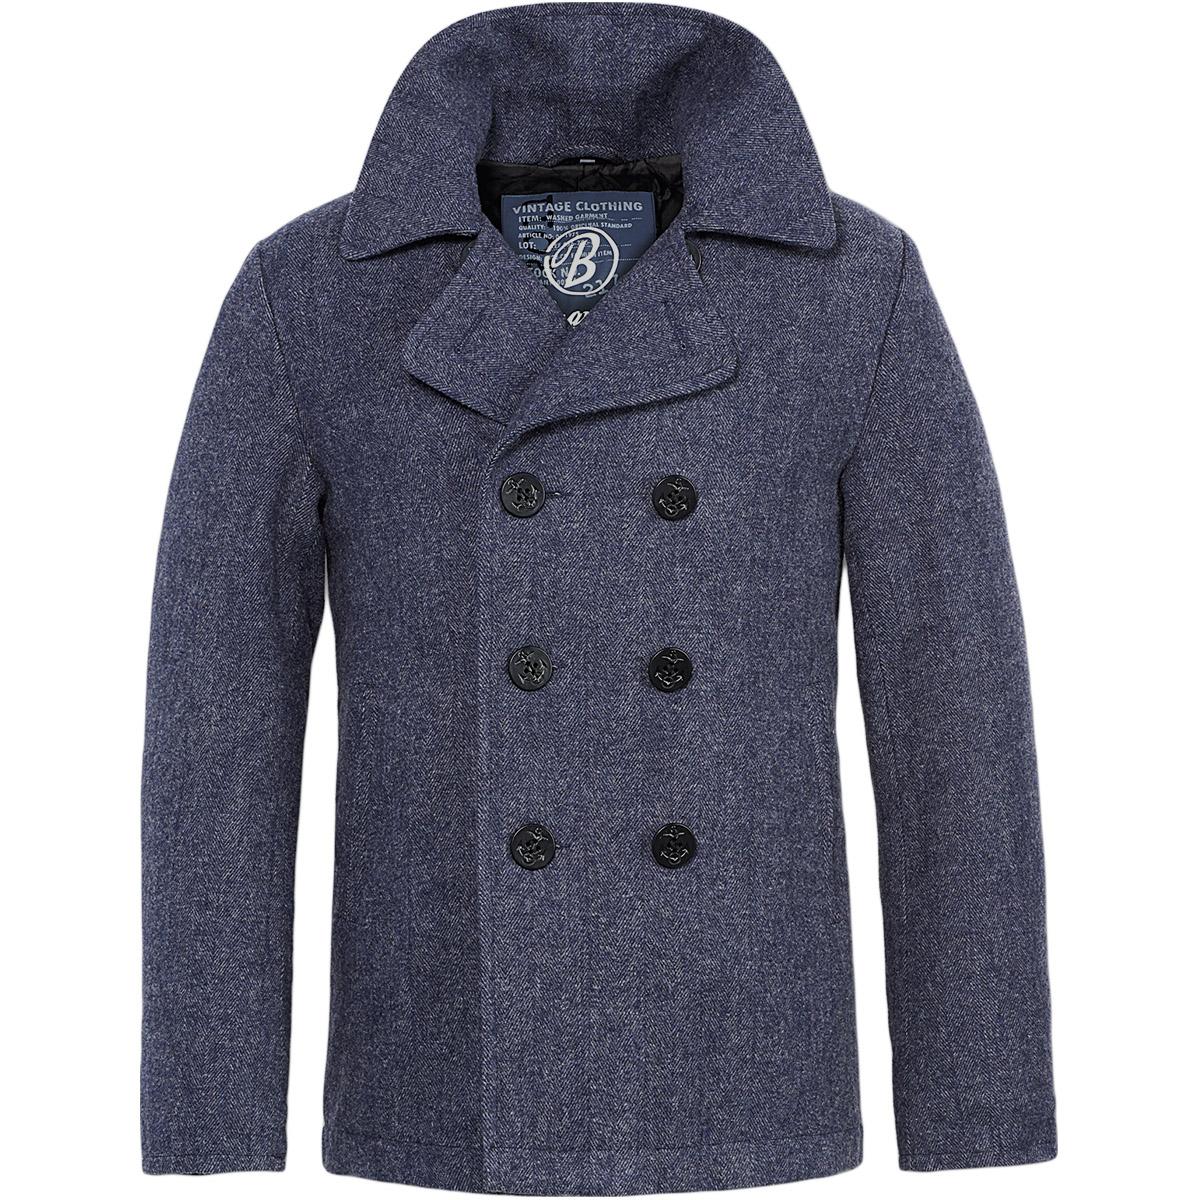 Navy blue mens pea jacket